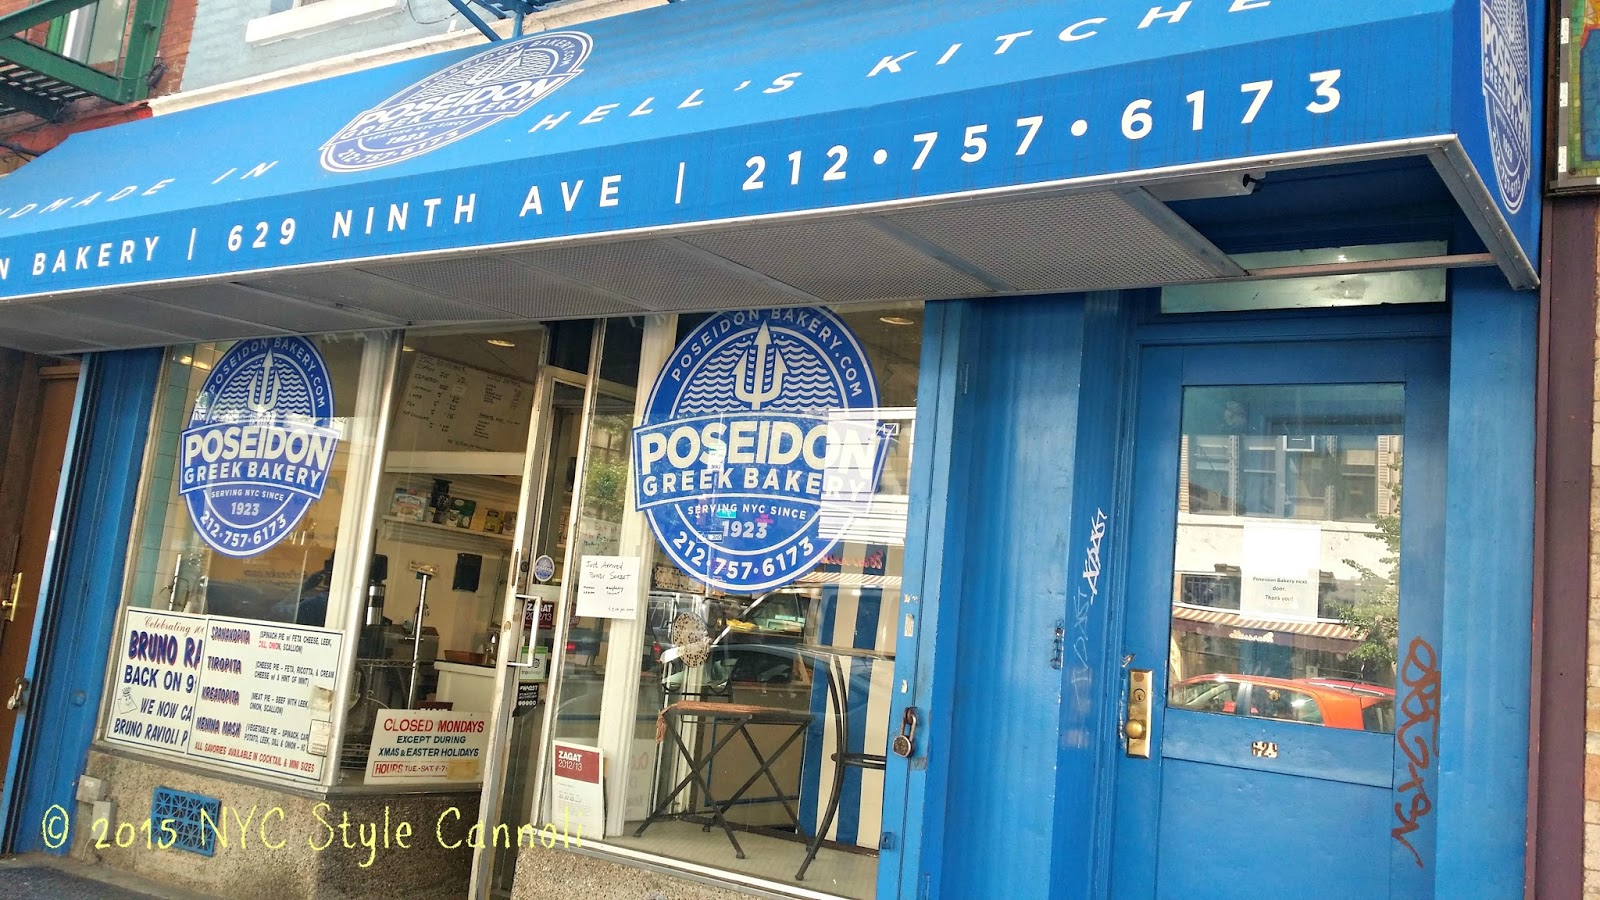 Poseidon Greek Bakery | NYC, Style & a little Cannoli